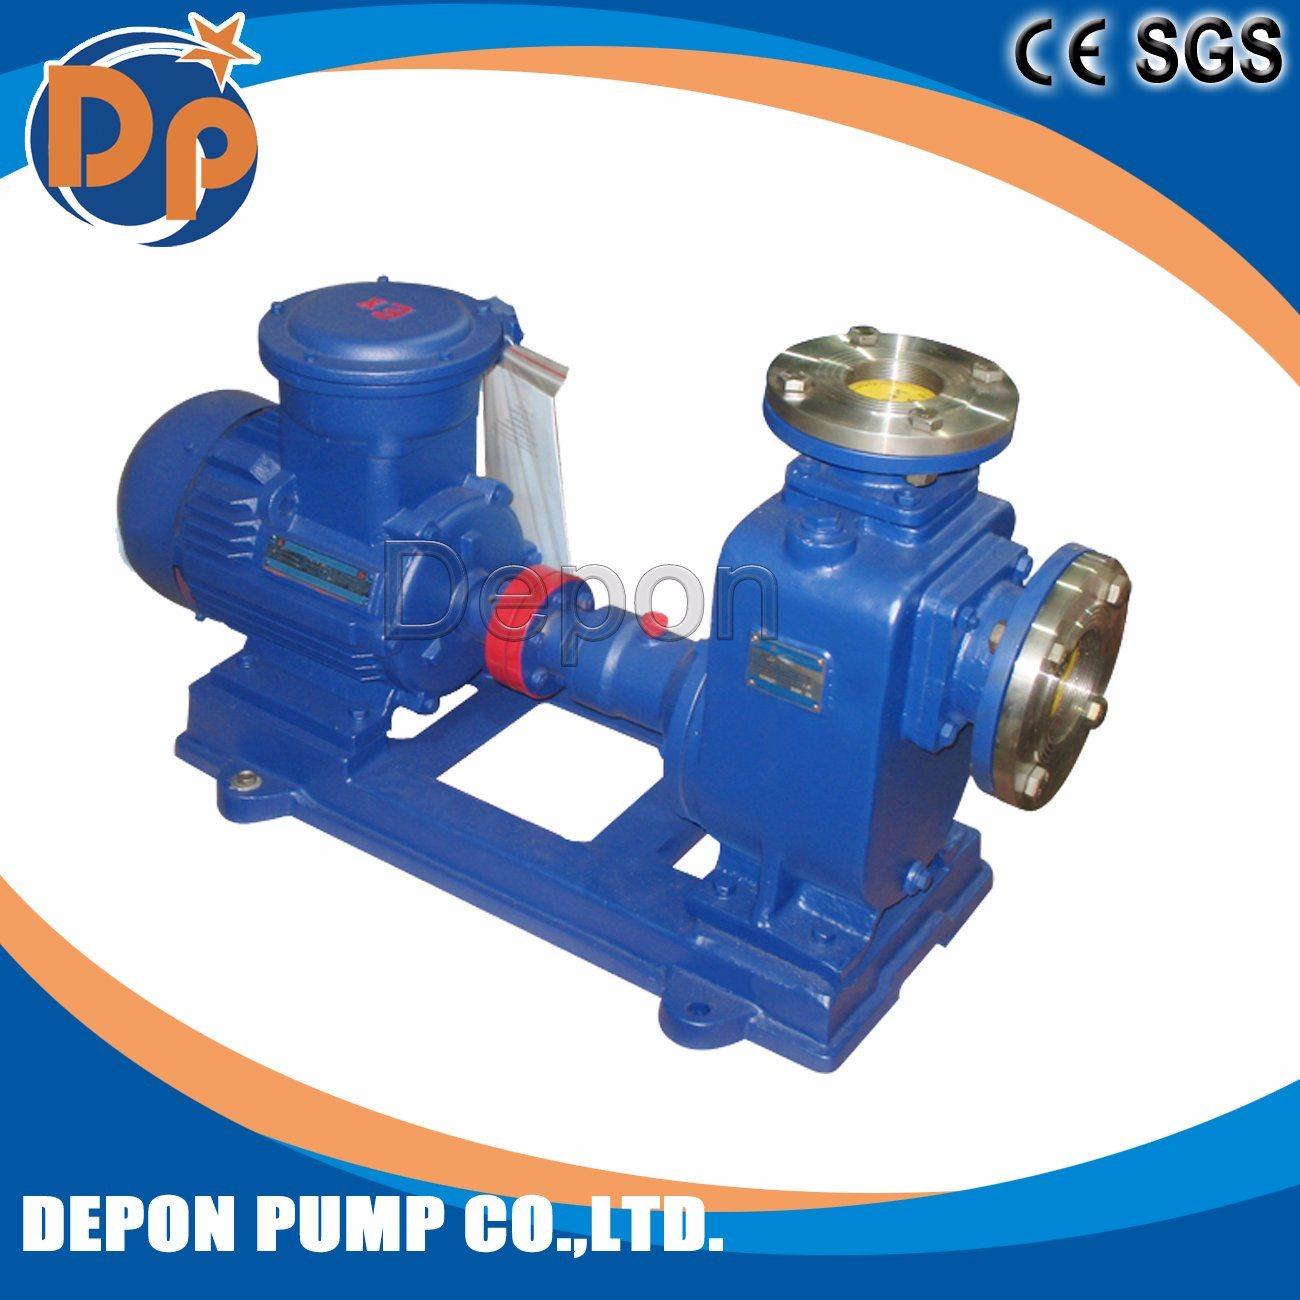 6 Inch Self Priming Non-Clogging Sewage Pump Trash Pump